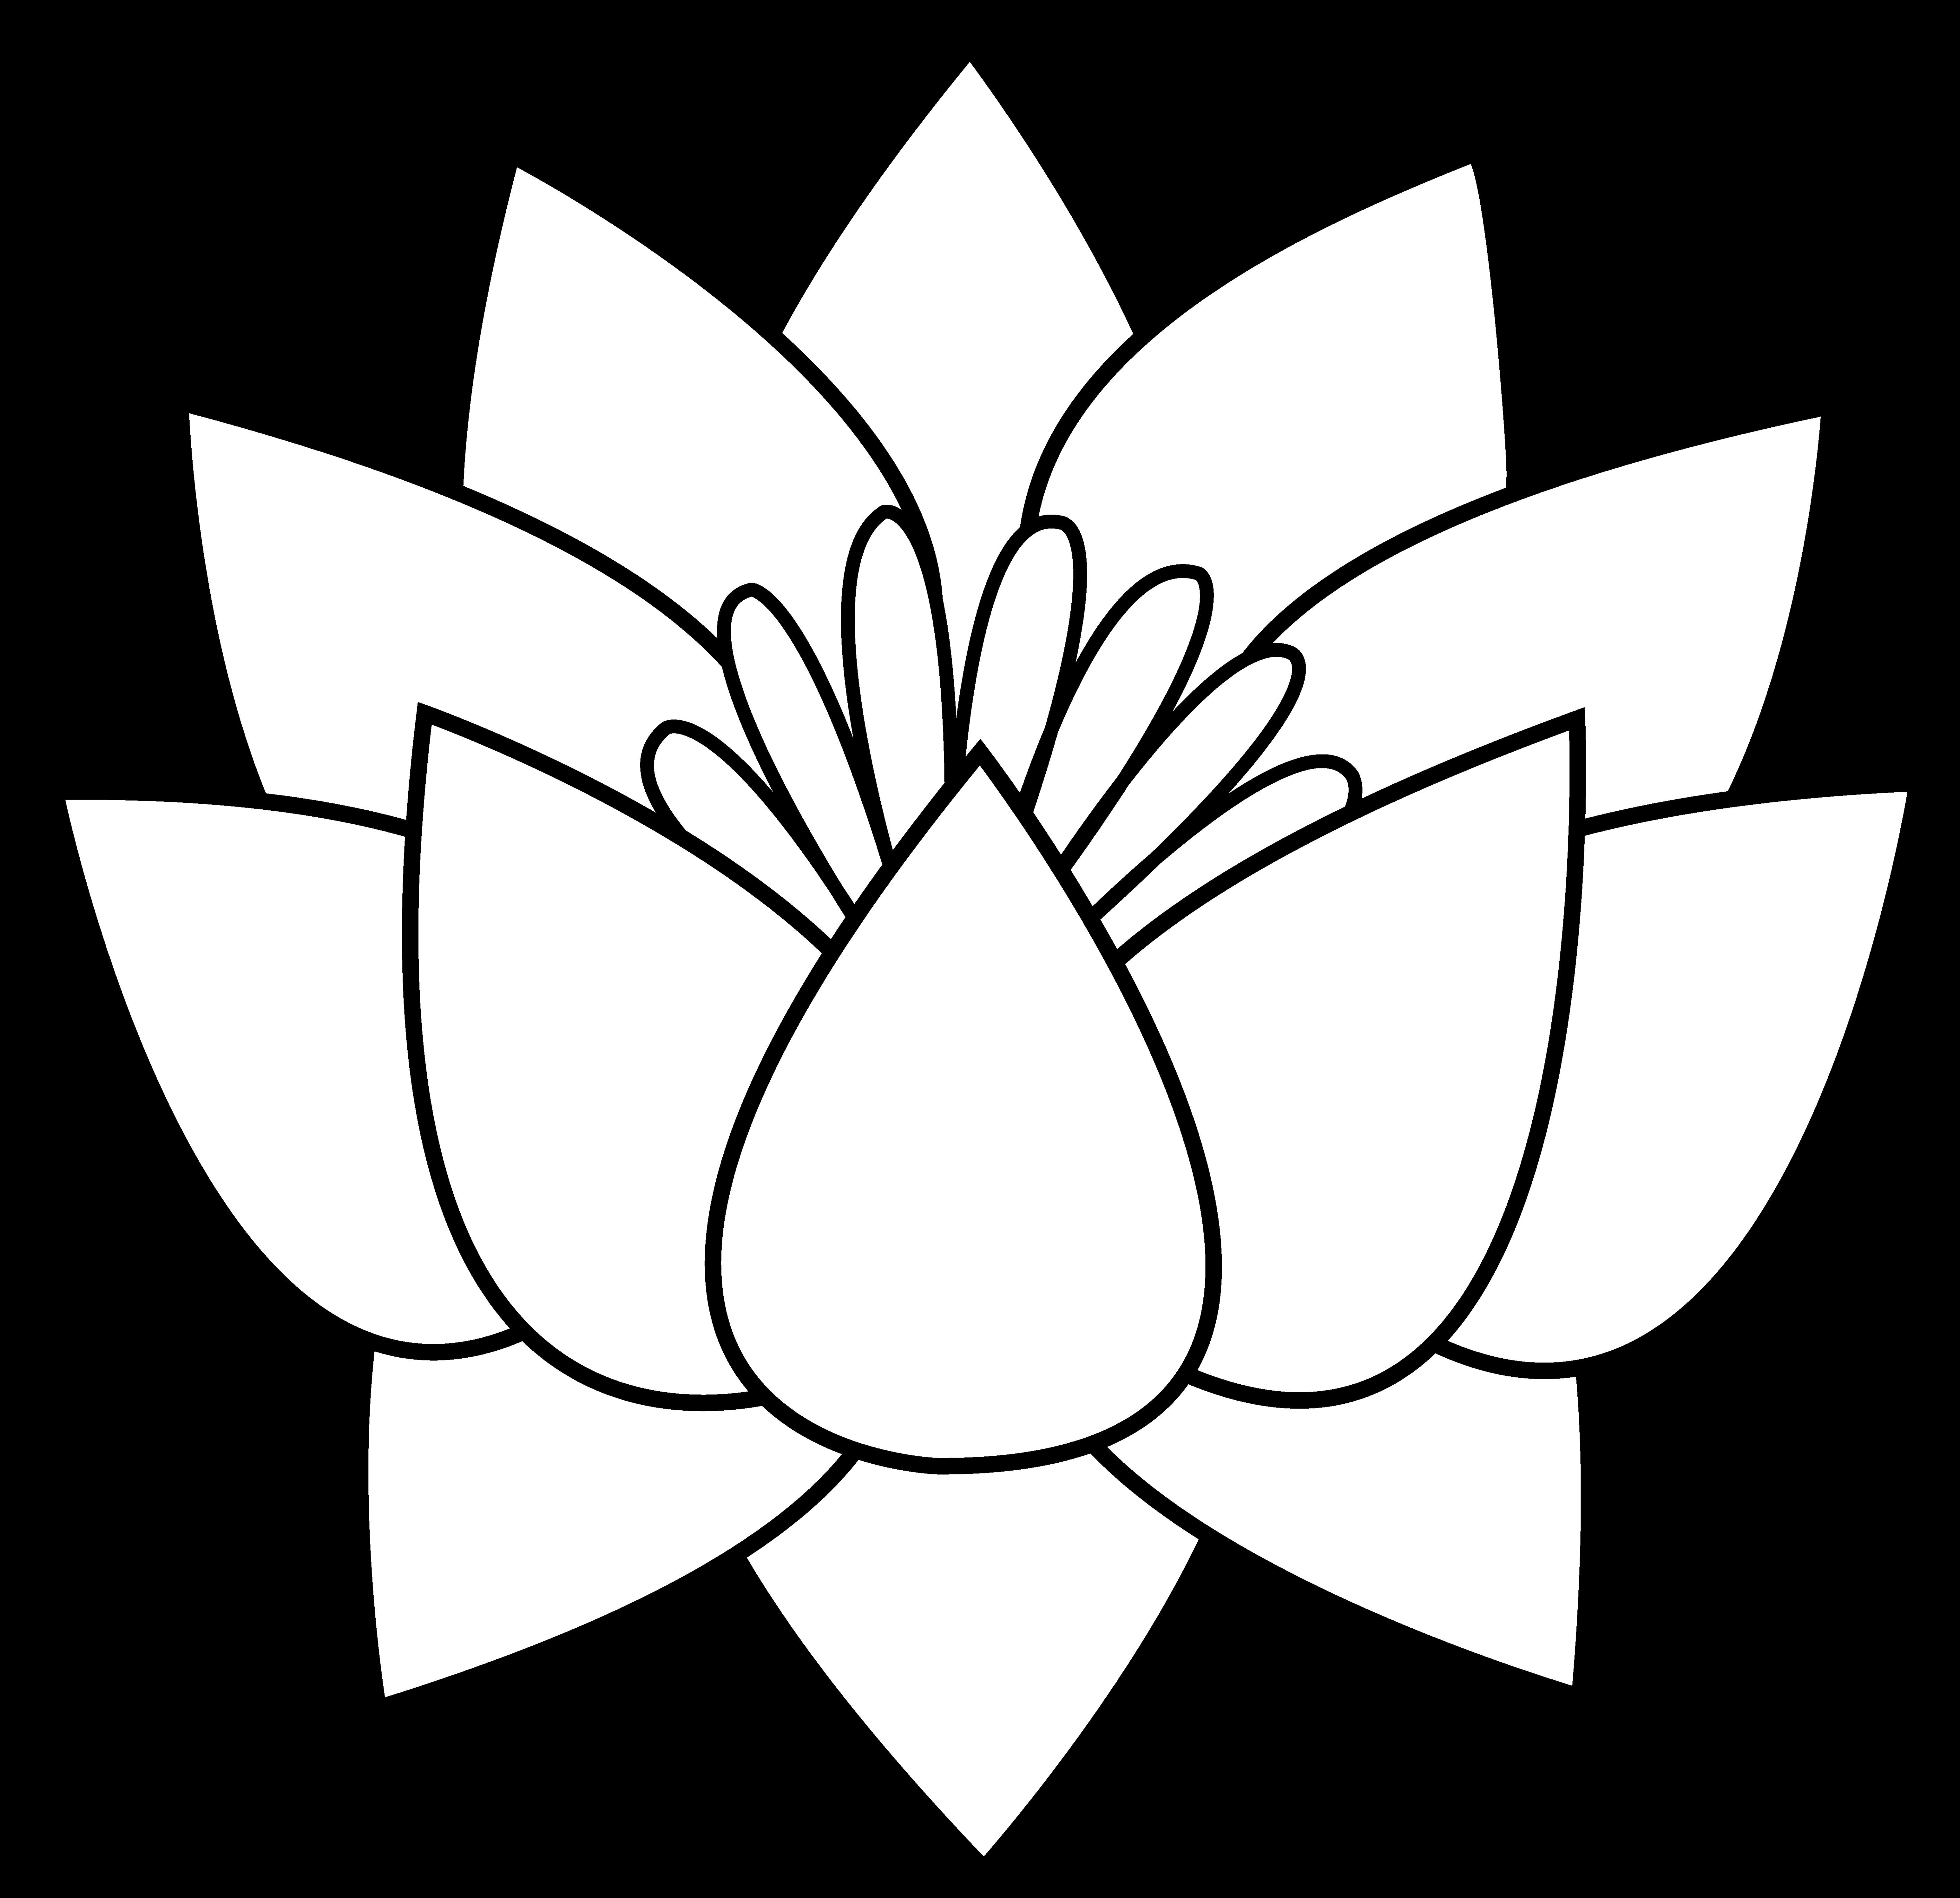 Flower Outline Drawing | Free download best Flower Outline